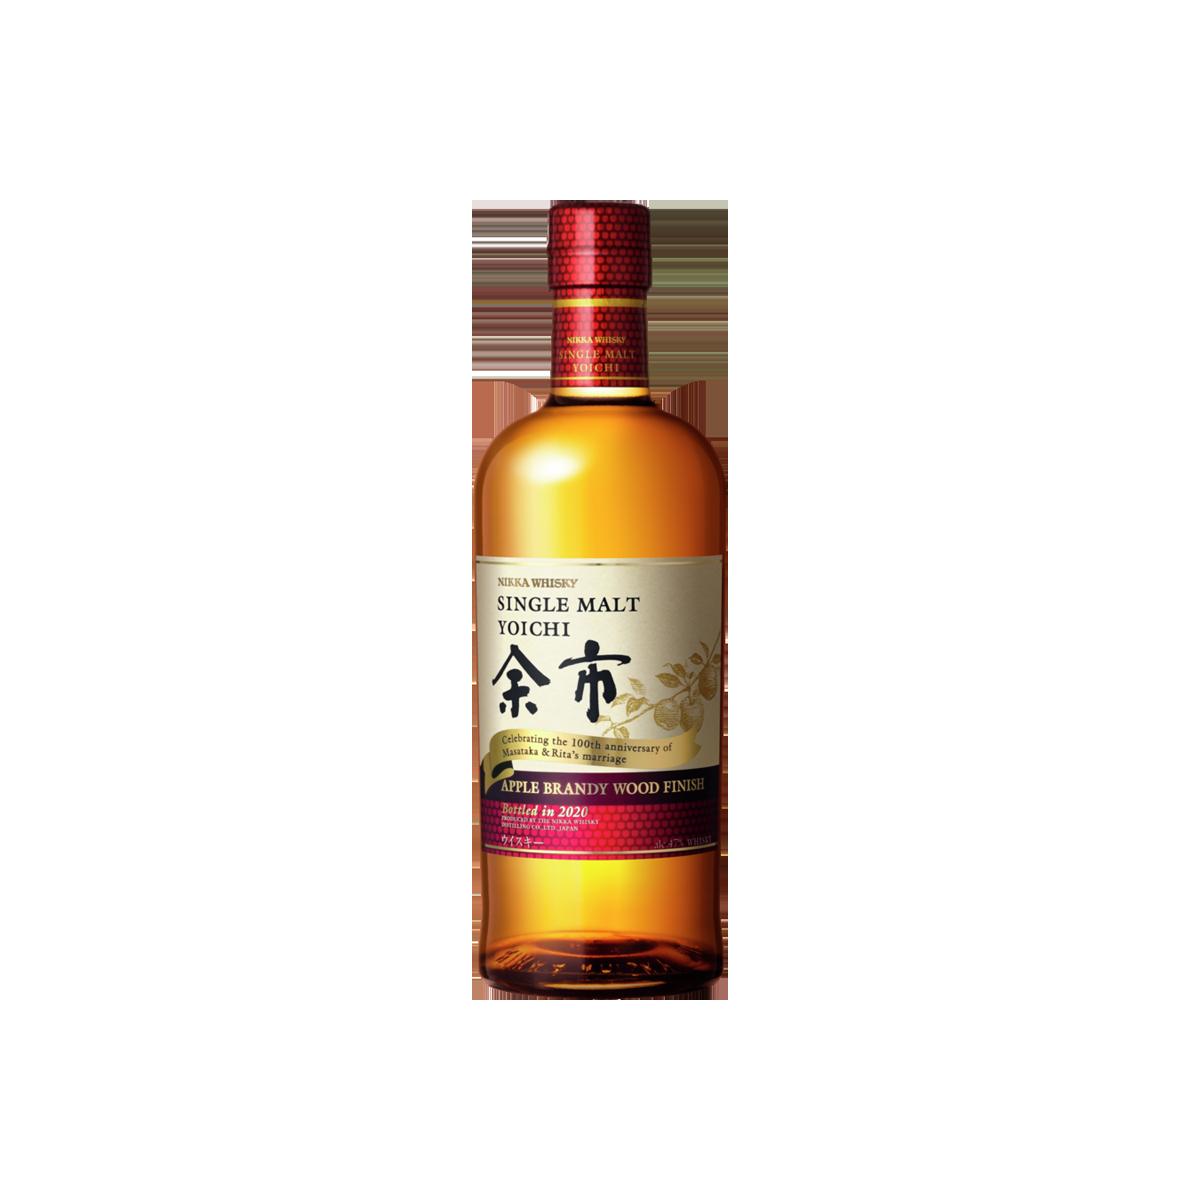 Nikka Yoichi Apple Brandy Wood Finish Whisky 47 %